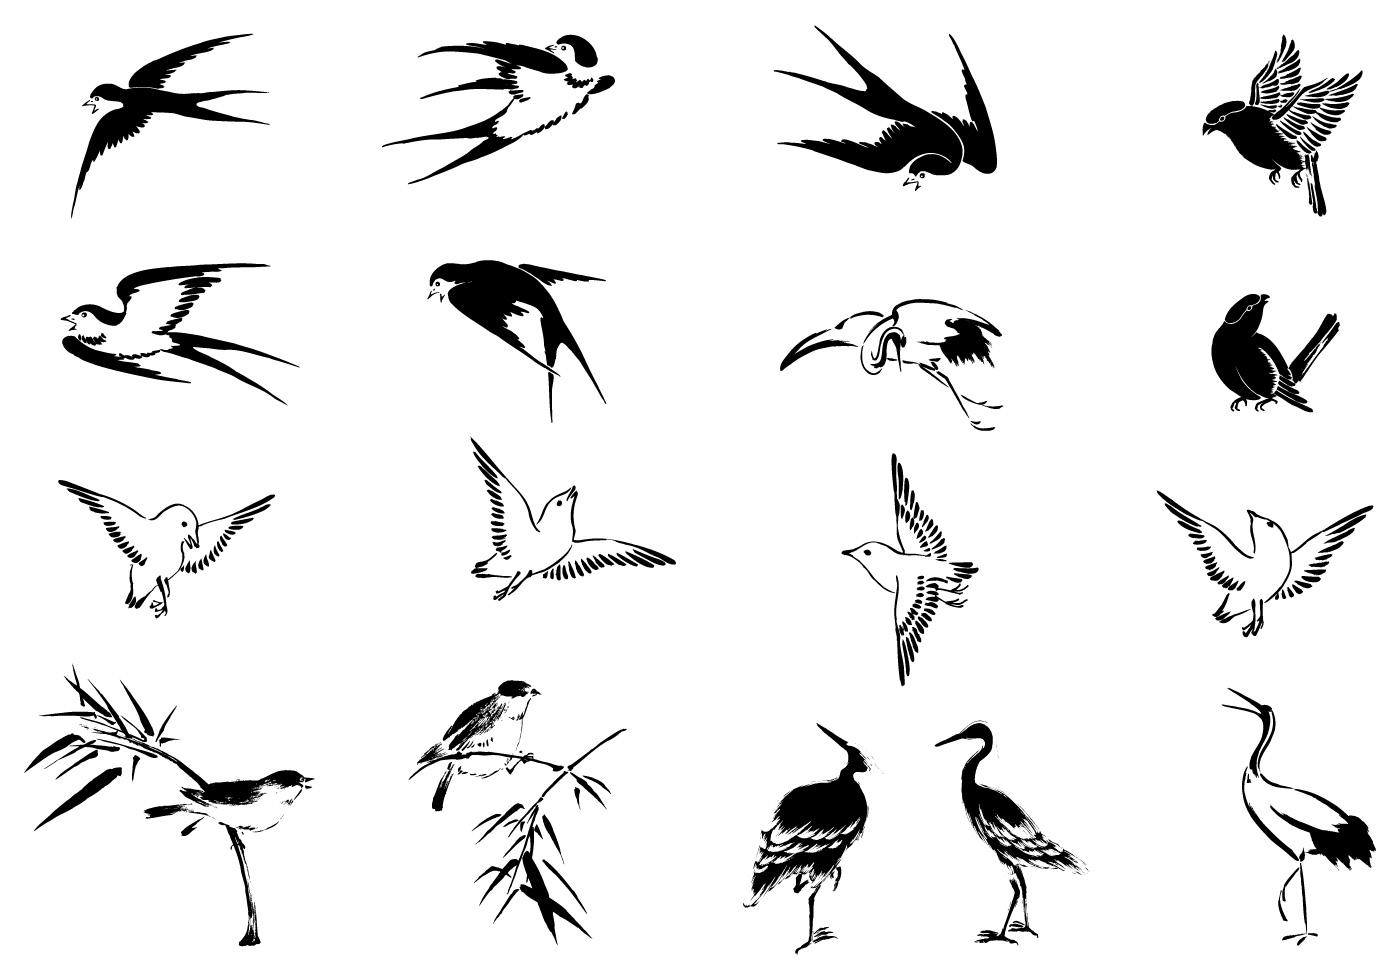 Flying Bird Vector Pack - Download Free Vectors, Clipart ... - photo#7